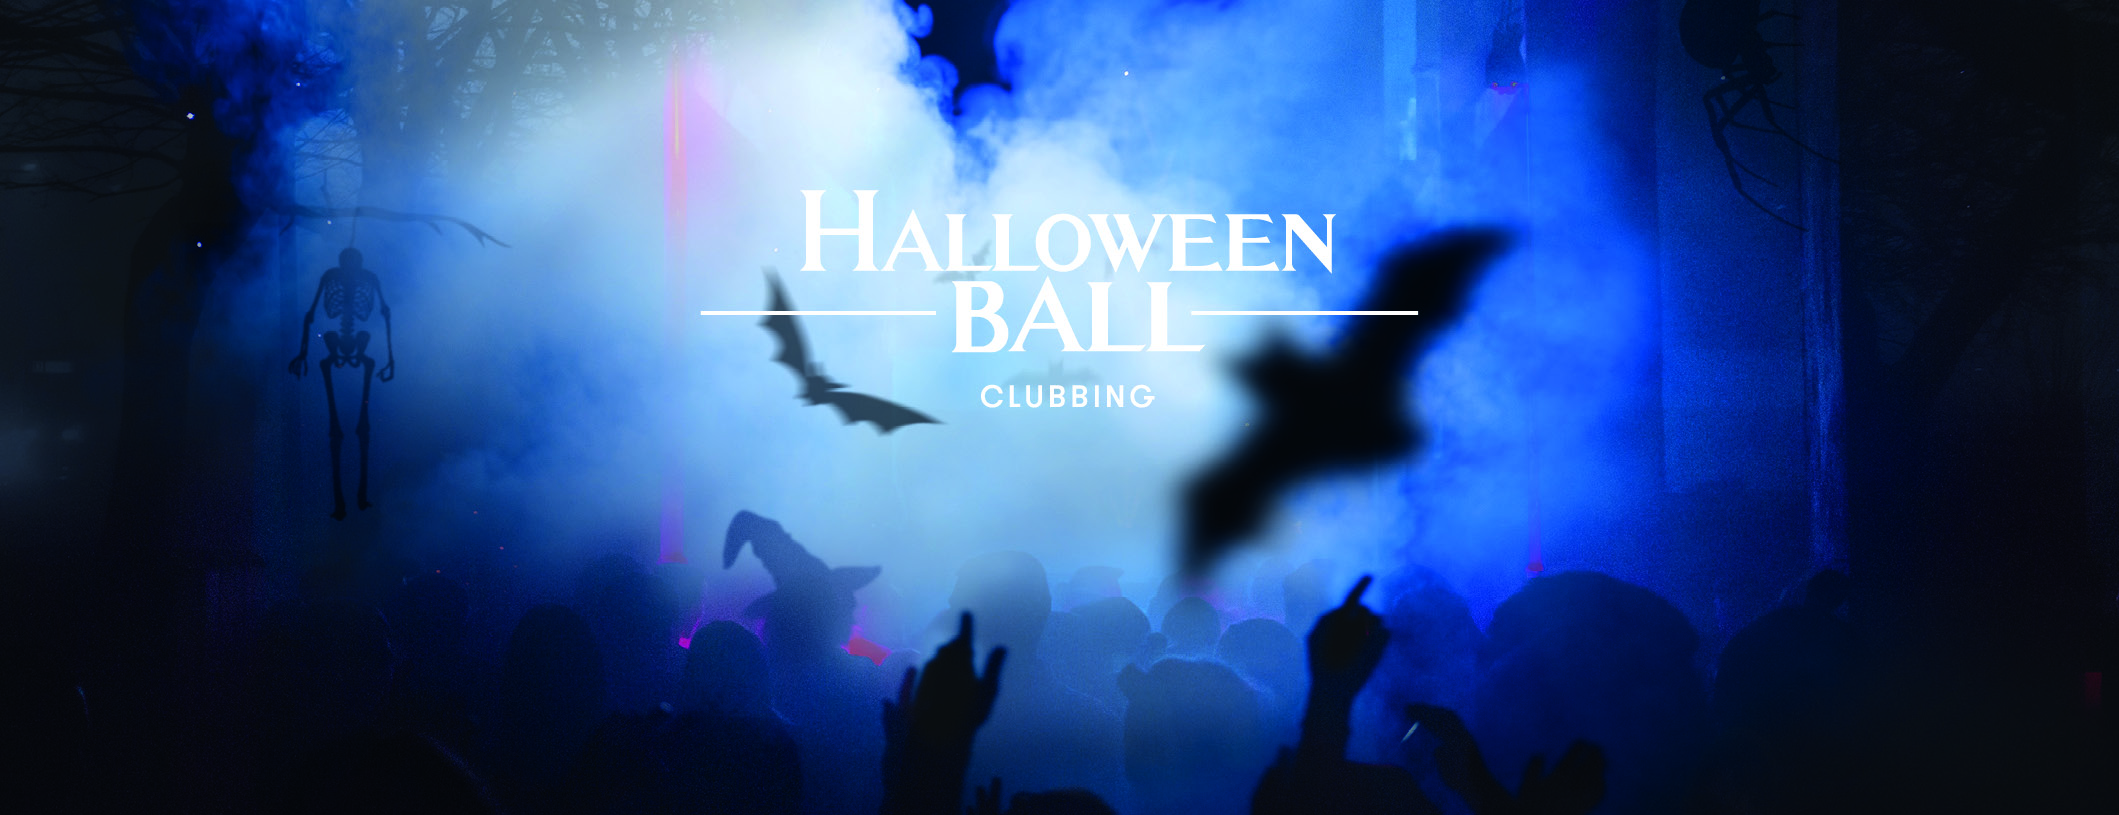 Halloweenball_Clubbing_Ticket.jpg